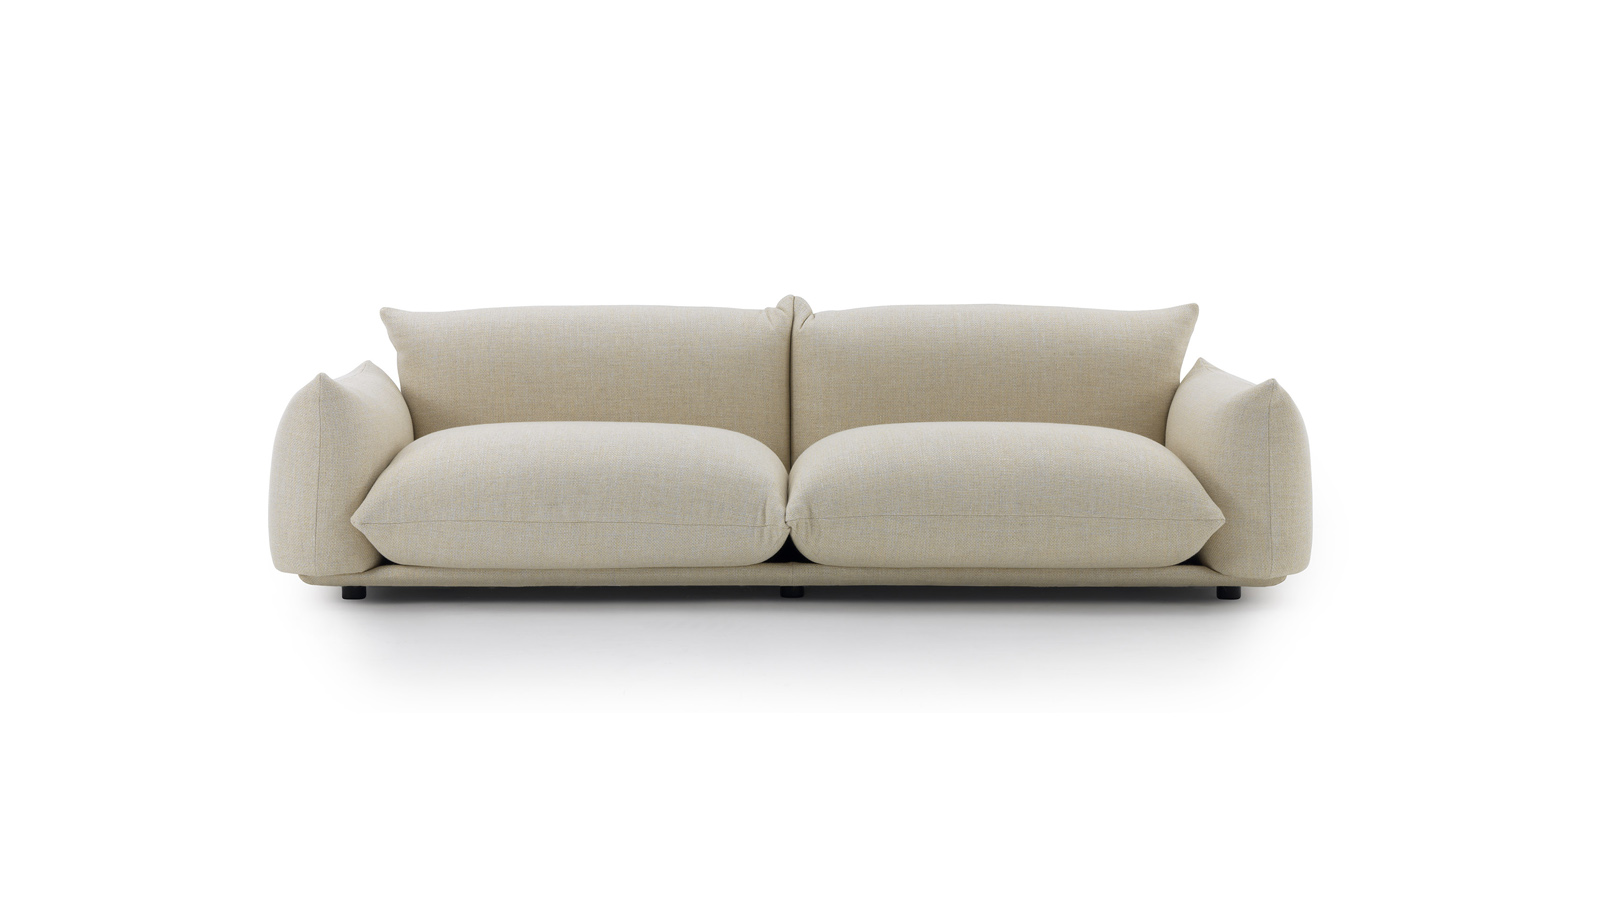 TinnappelMetz-arflex-marenco-sofa-03